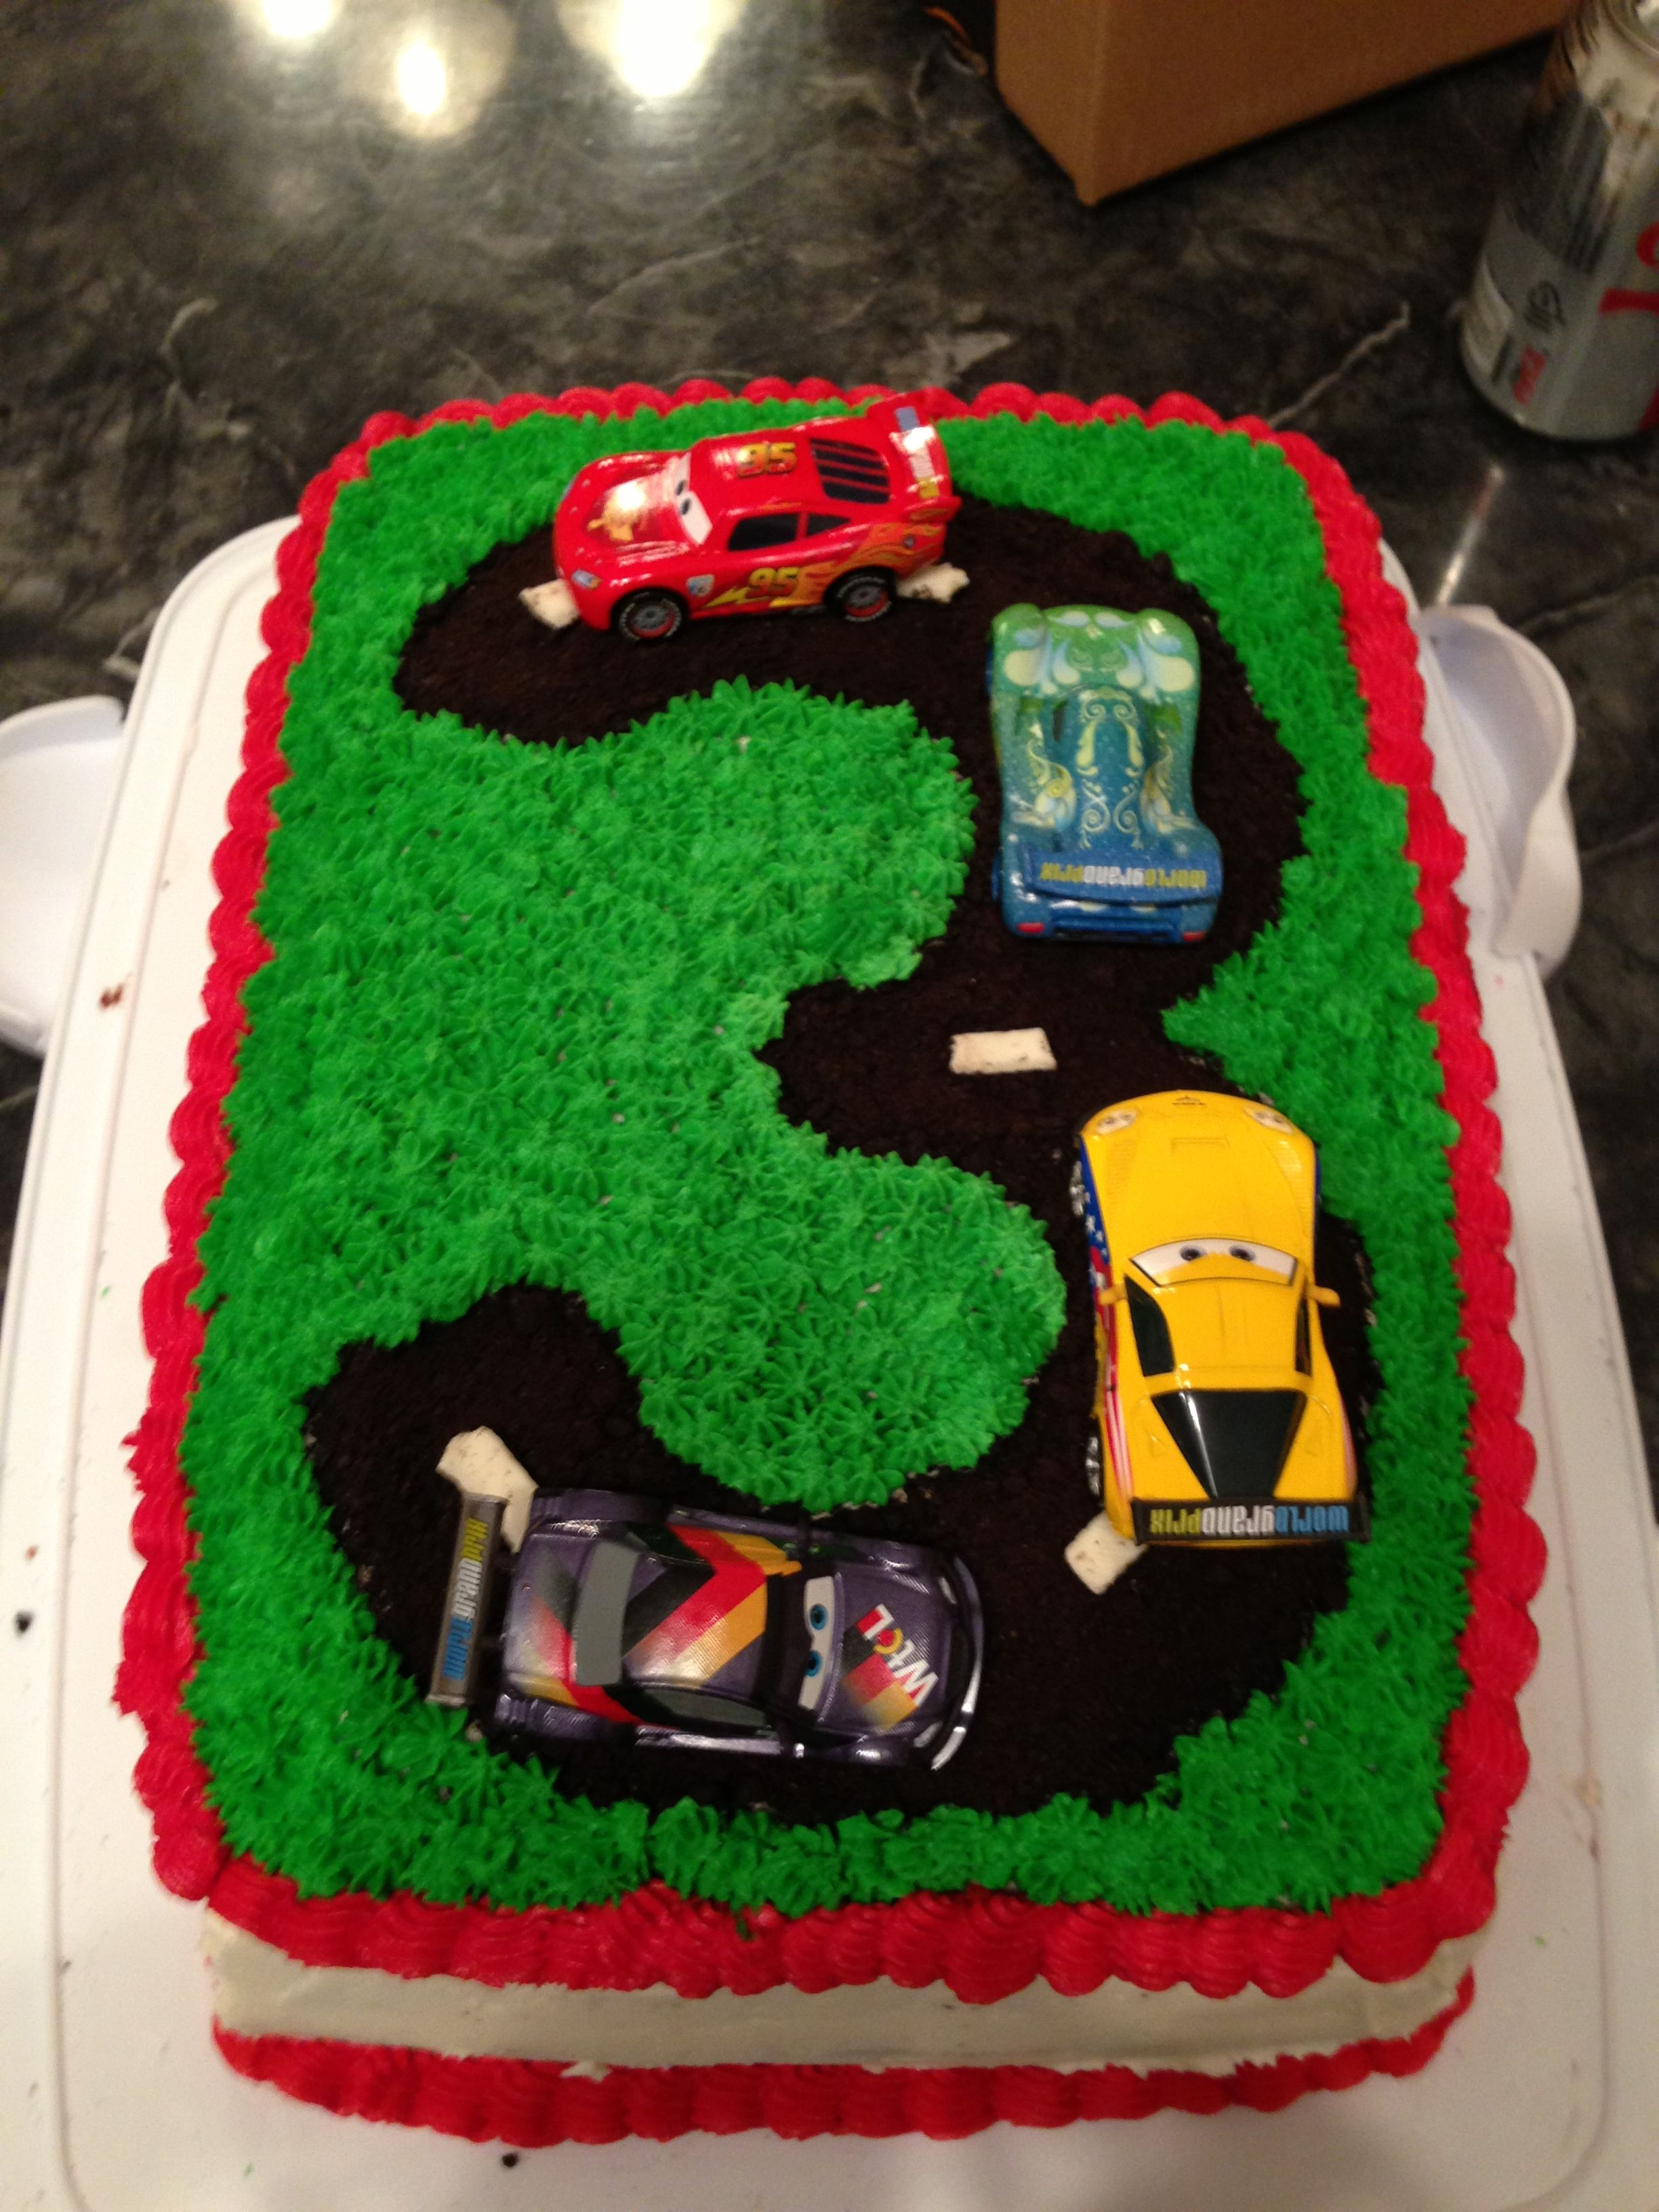 Birthday Cake Racing Cars Image Inspiration of Cake and Birthday